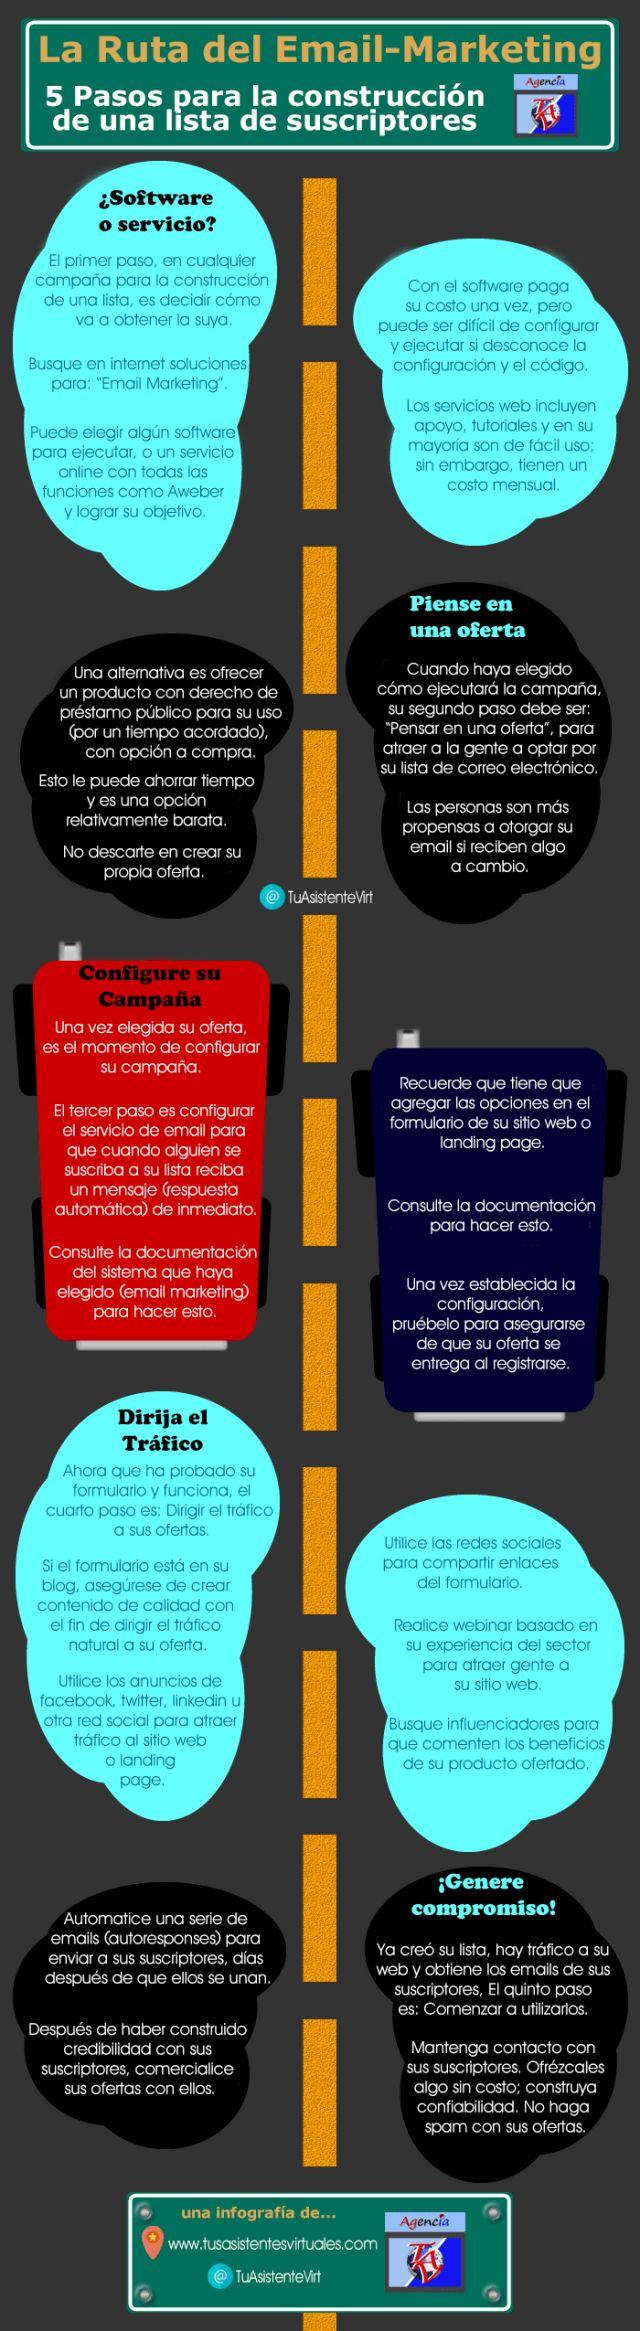 La ruta del email marketing #infographic